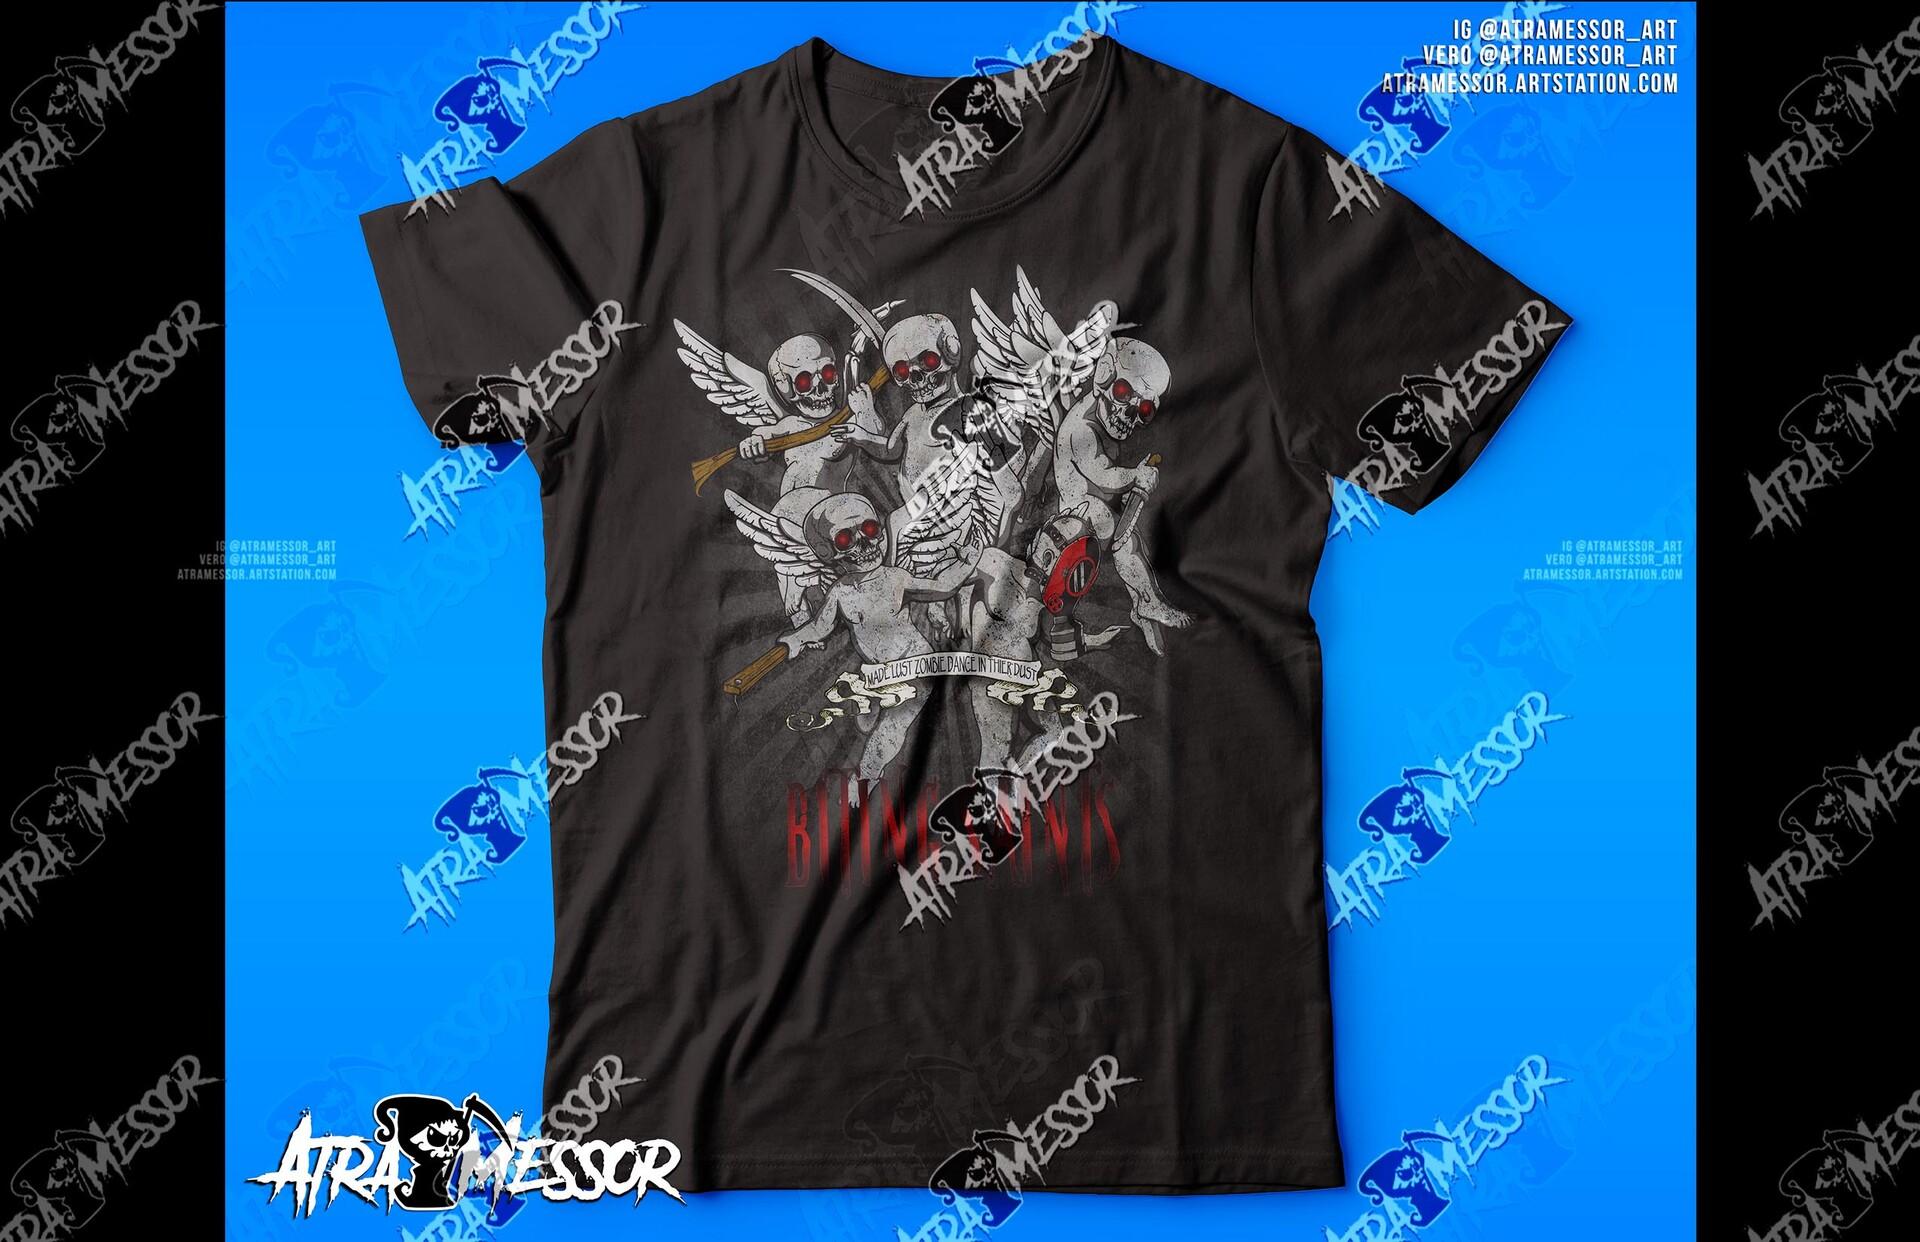 Biting Saints Shirt